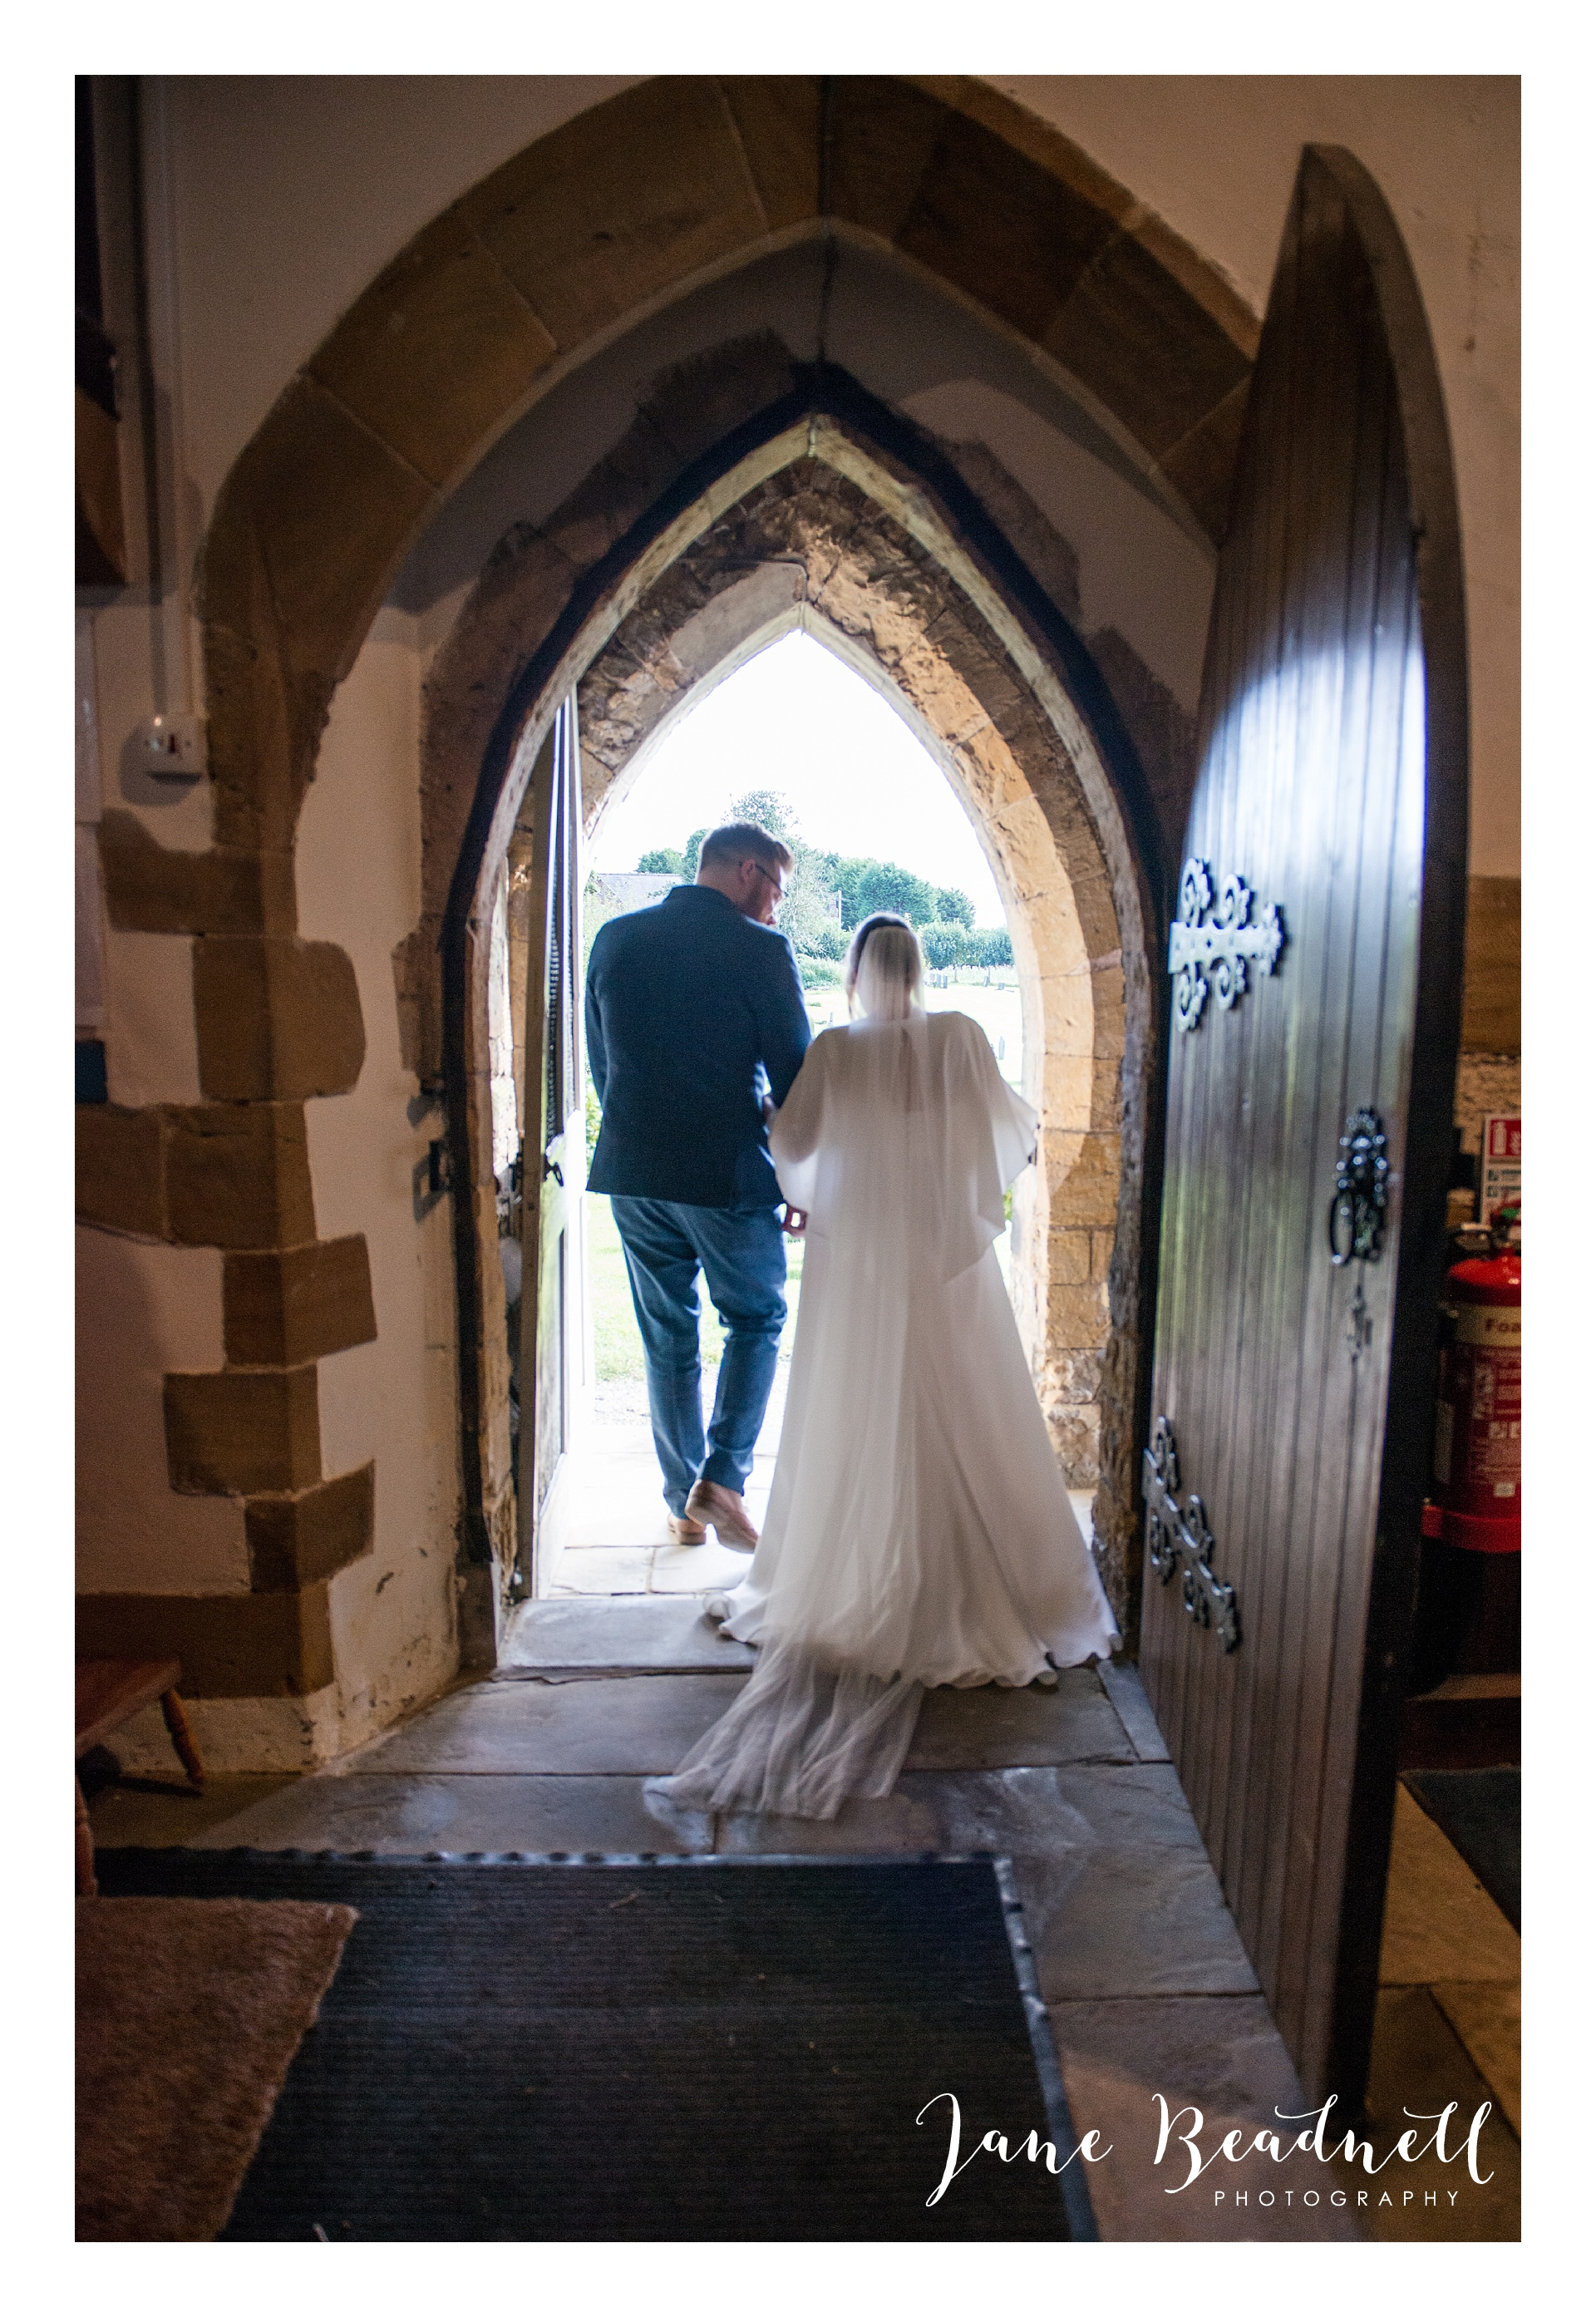 fine-art-wedding-photographer-jane-beadnell-yorkshire-wedding-photographer_0054